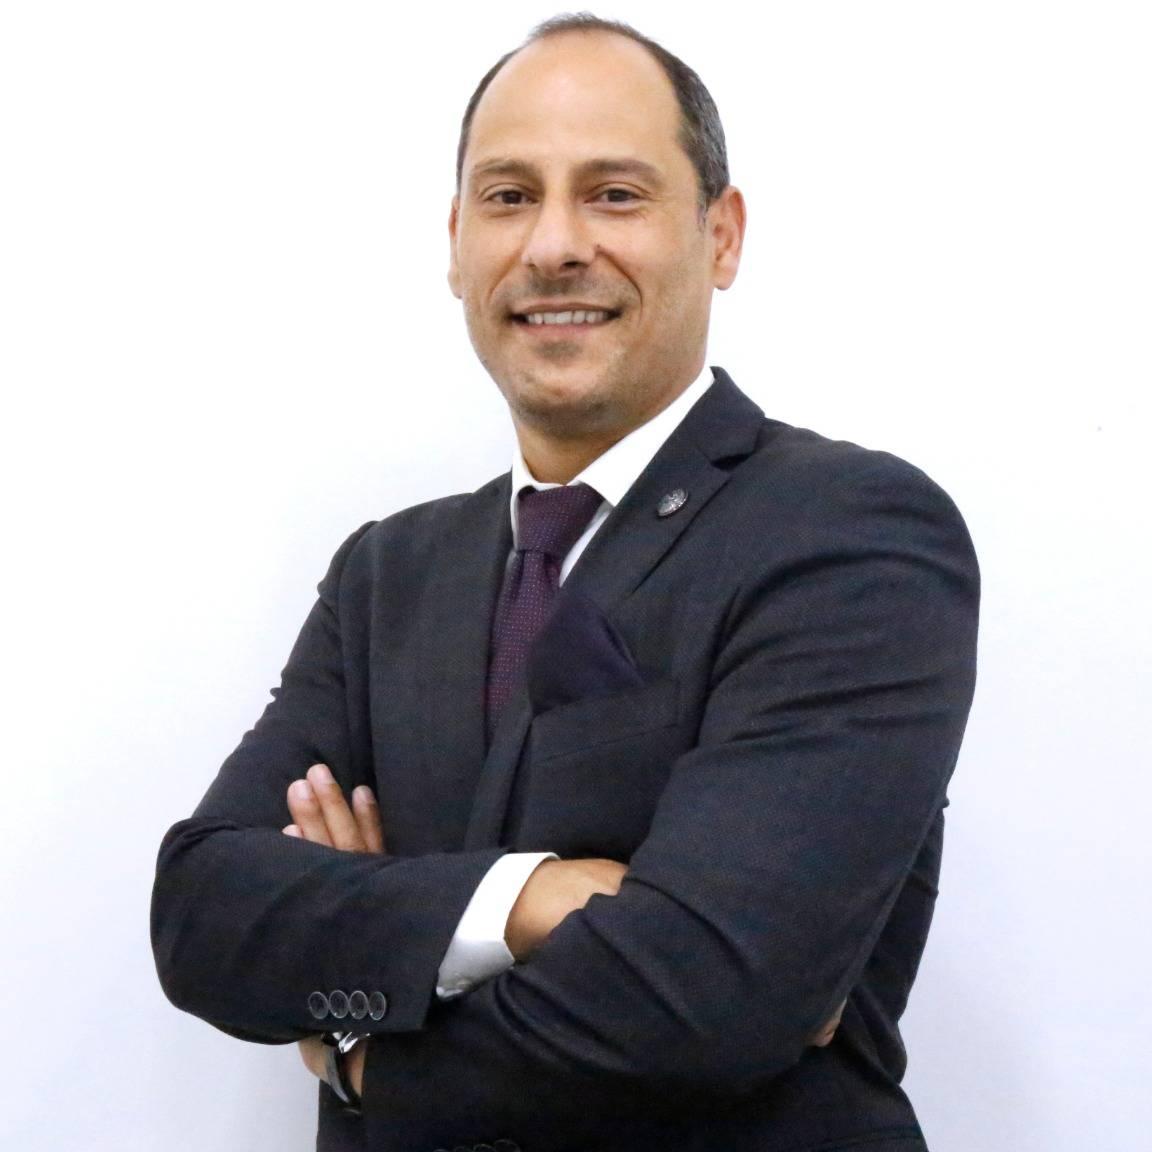 Moayyad Barakat